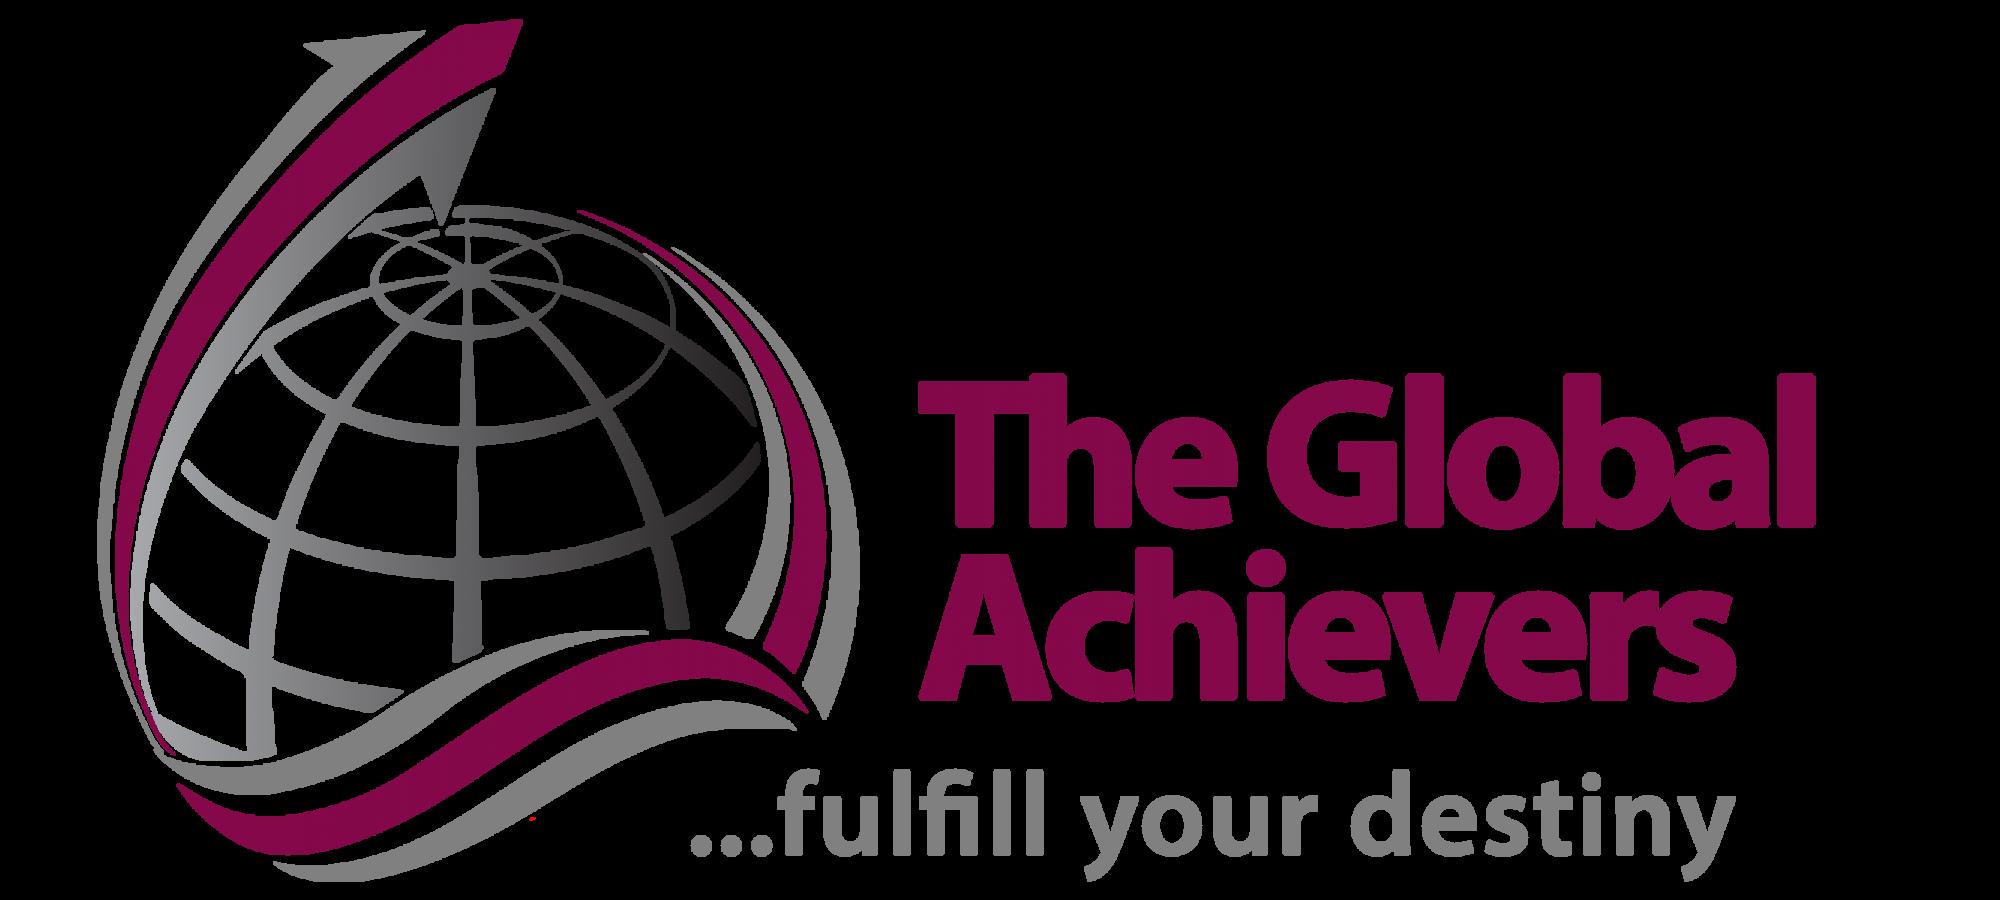 @the global acheivers logo